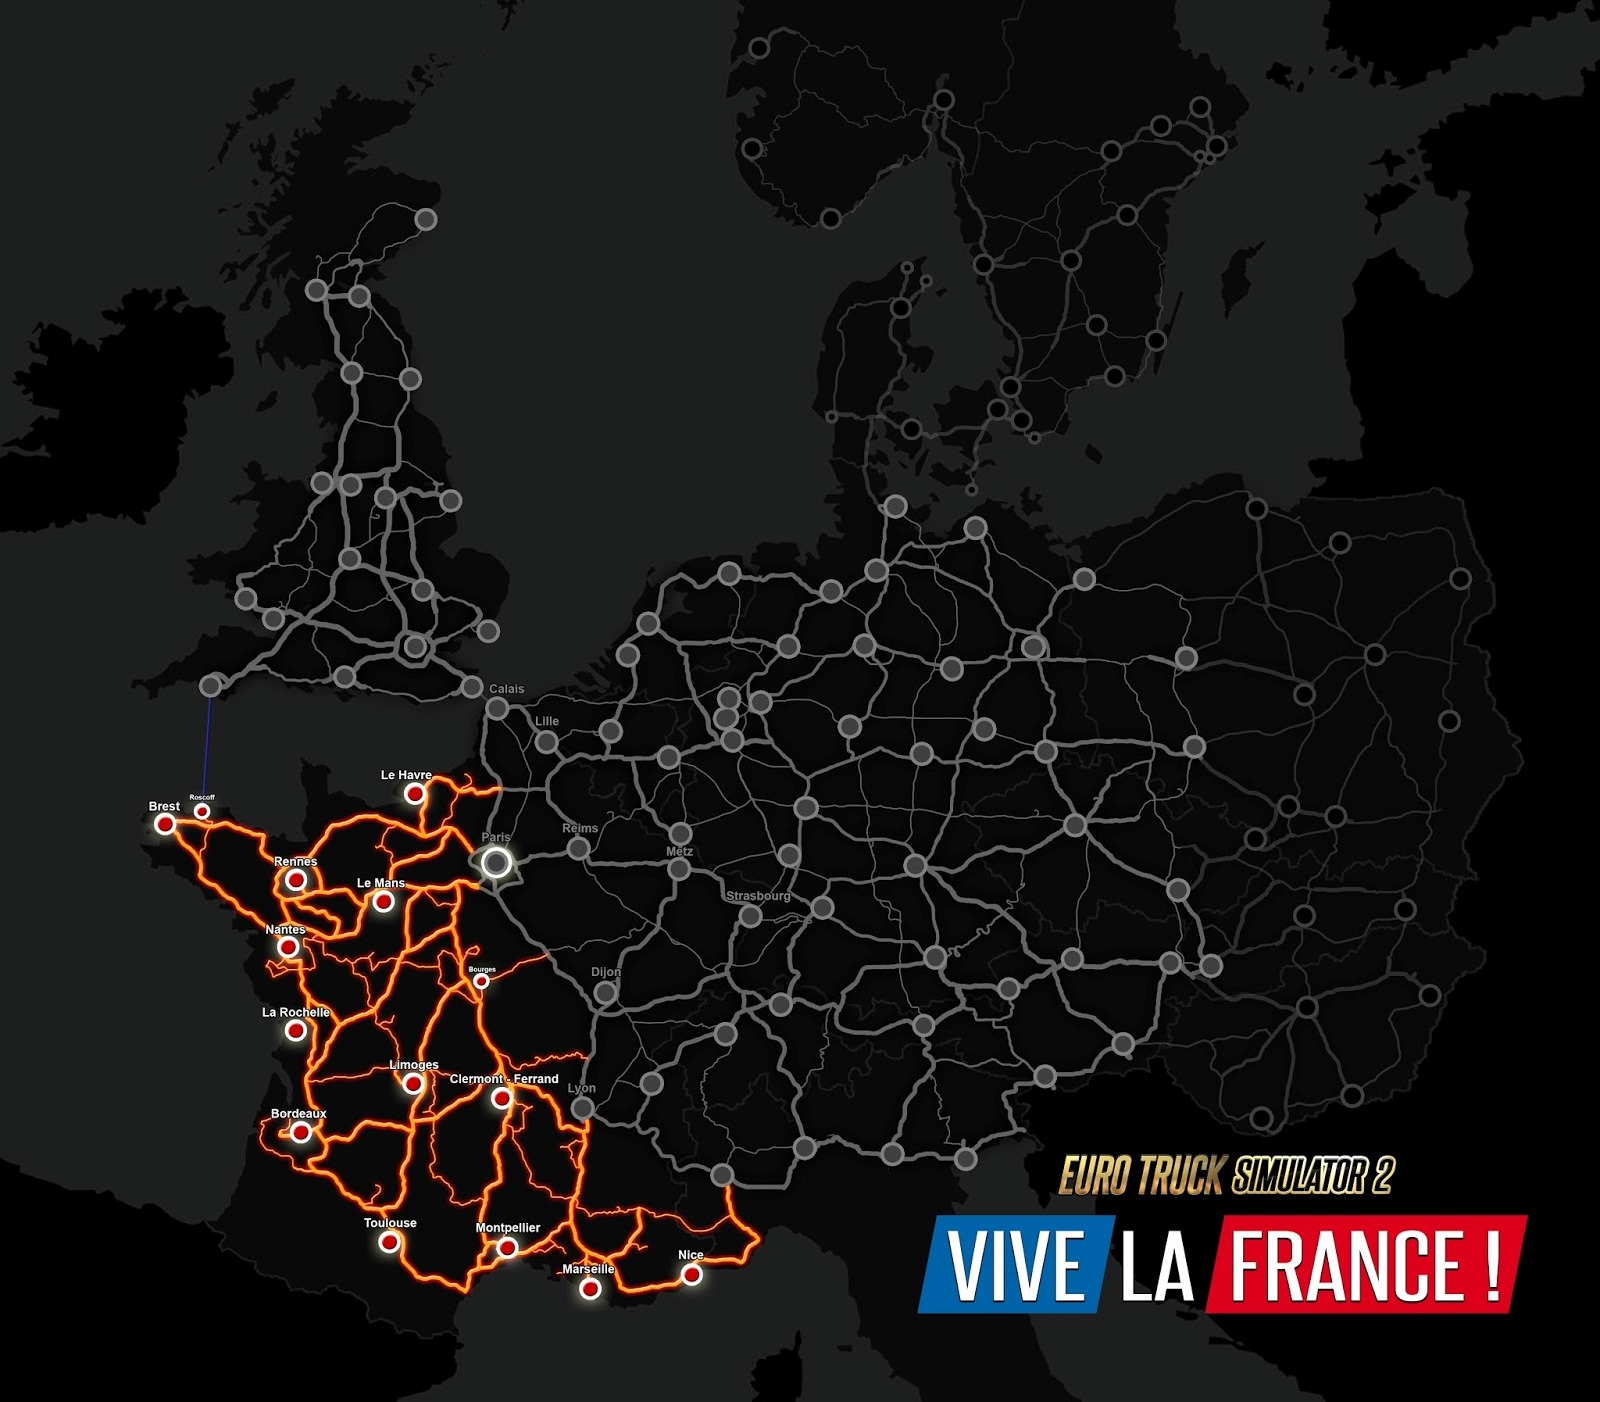 Vive la France!追加エリア